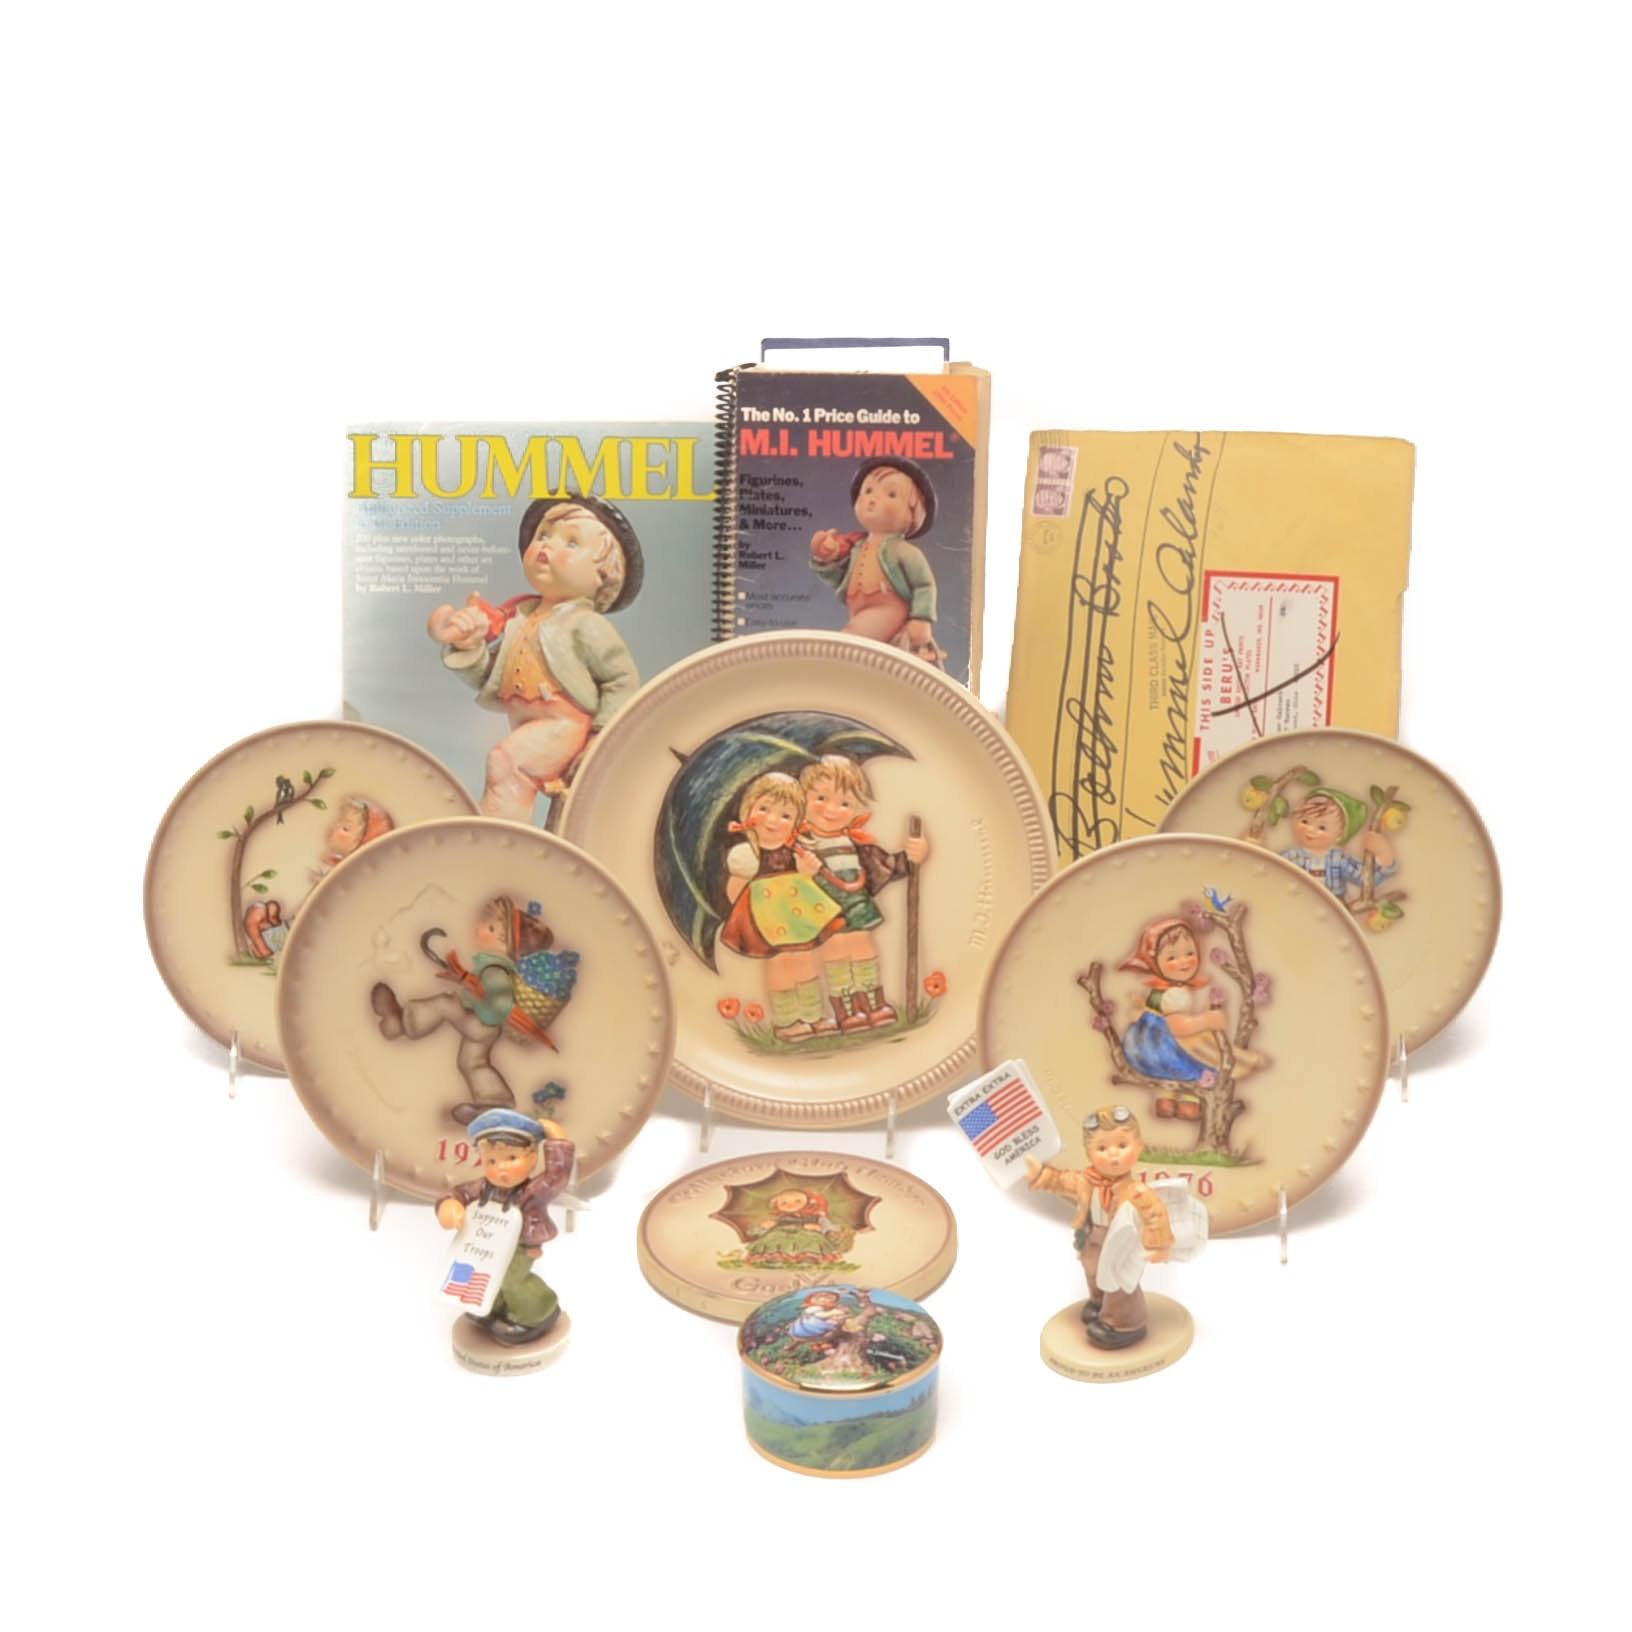 1970s M.J. Hummel Collectibles including Goebel Plates